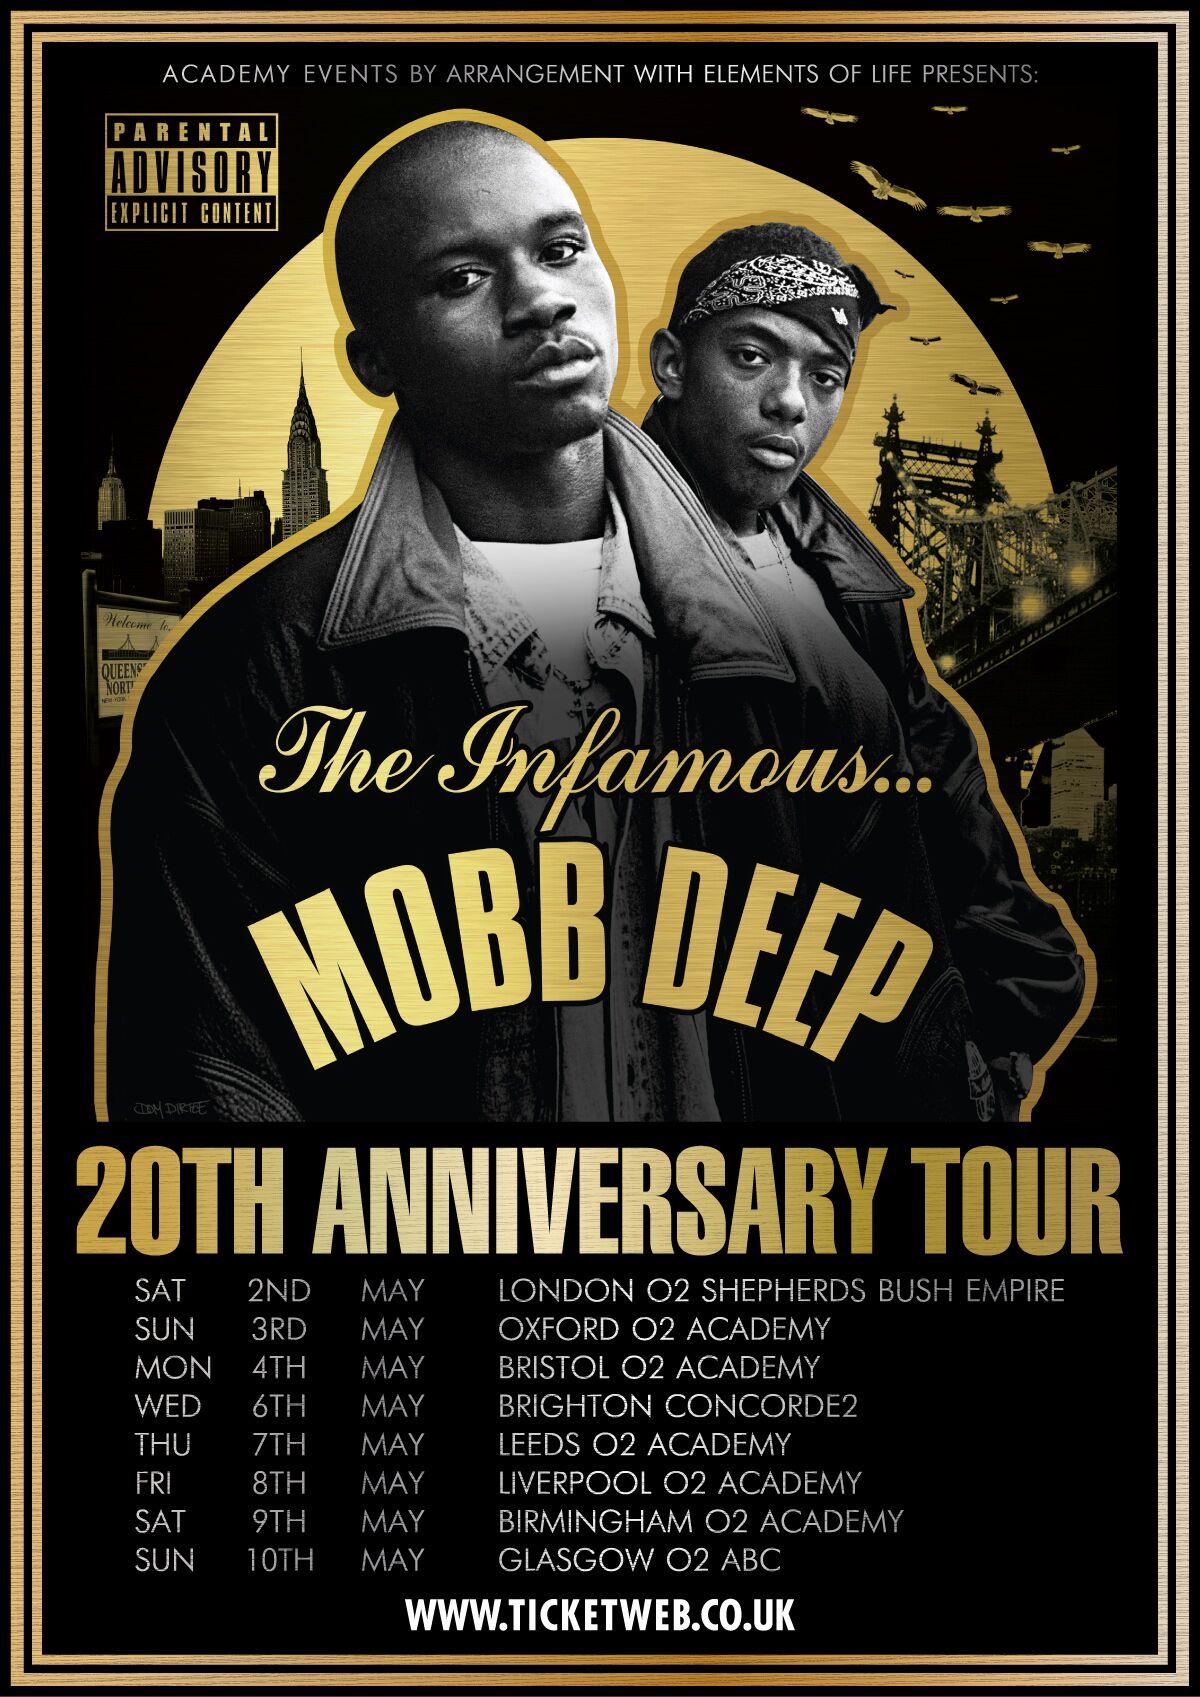 Mobb Deep 20th Anniversary Tour